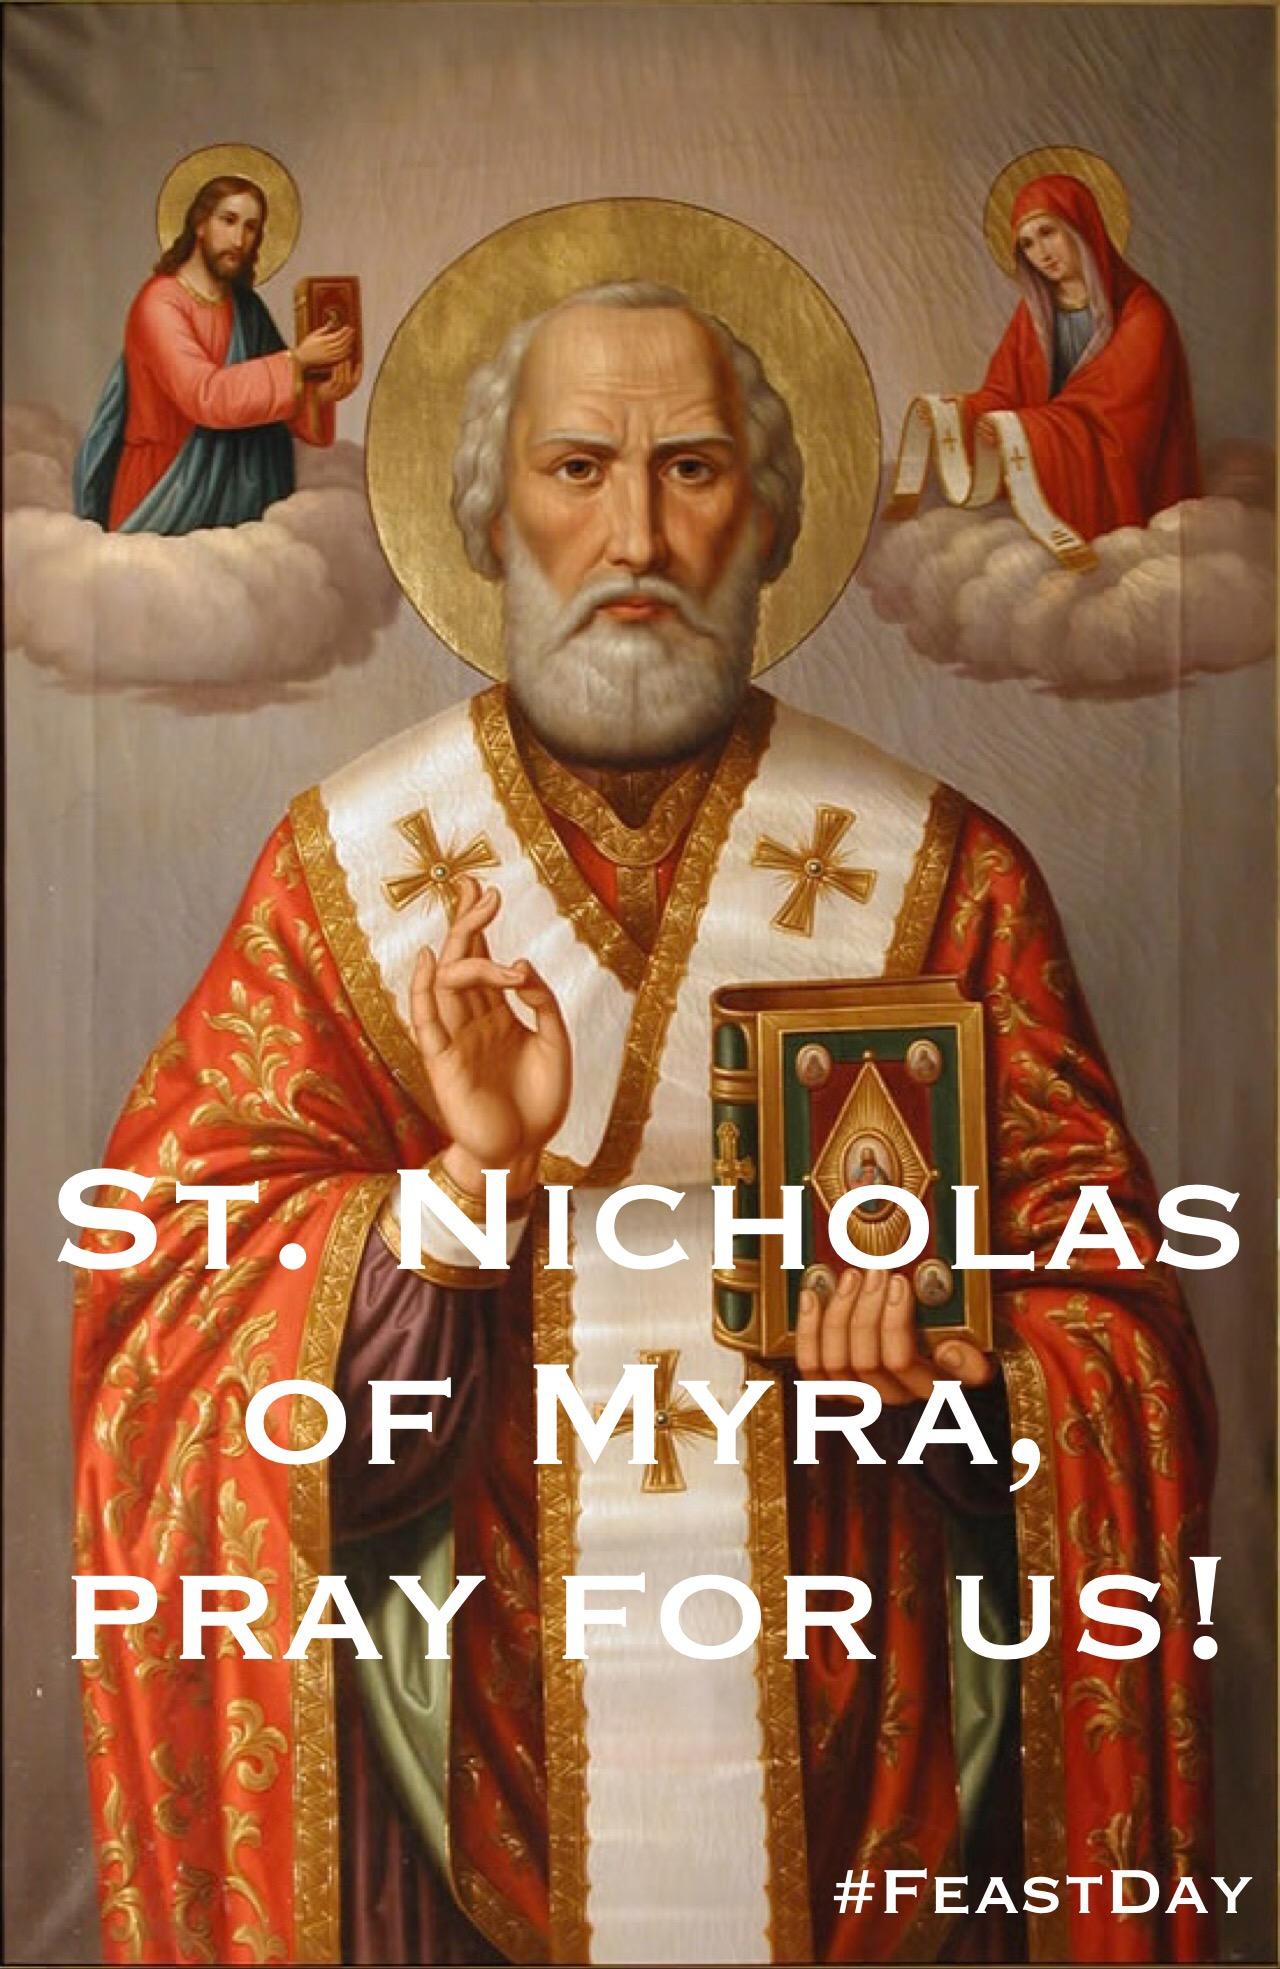 Who is st nicholas the patron saint of